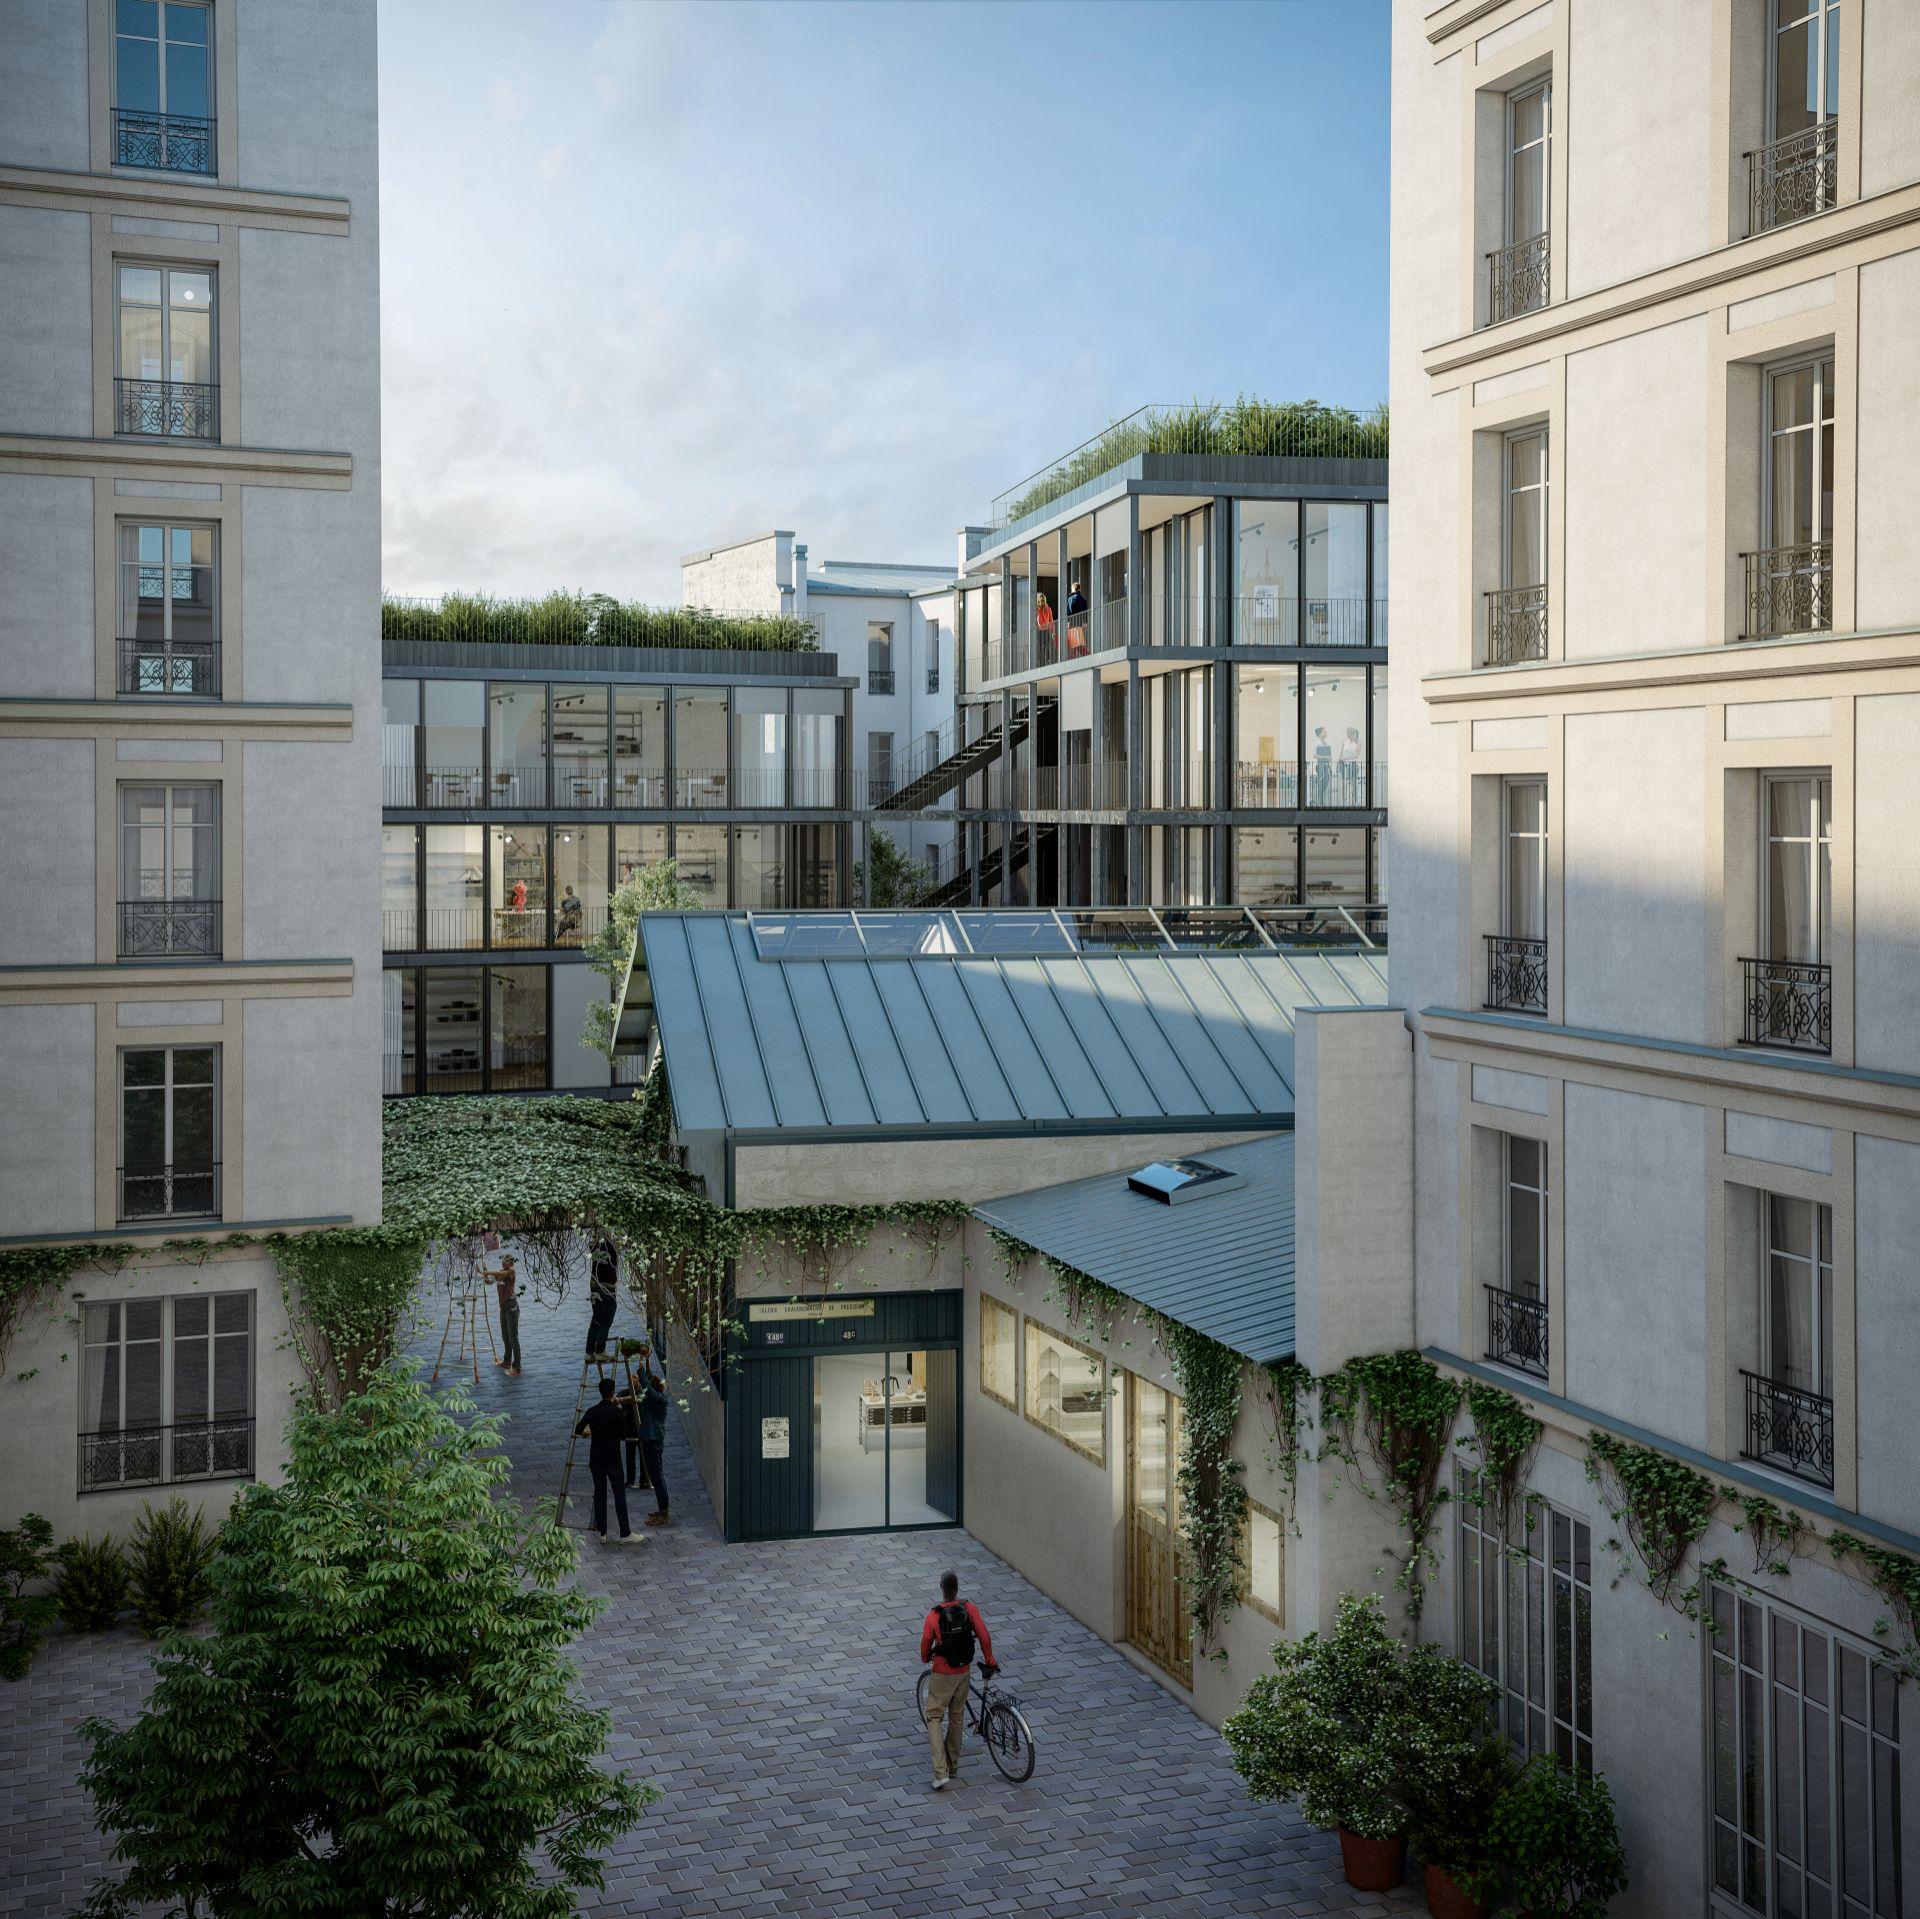 Supervue la architectures eqt pepiniere artisanale rue bisson cMedium